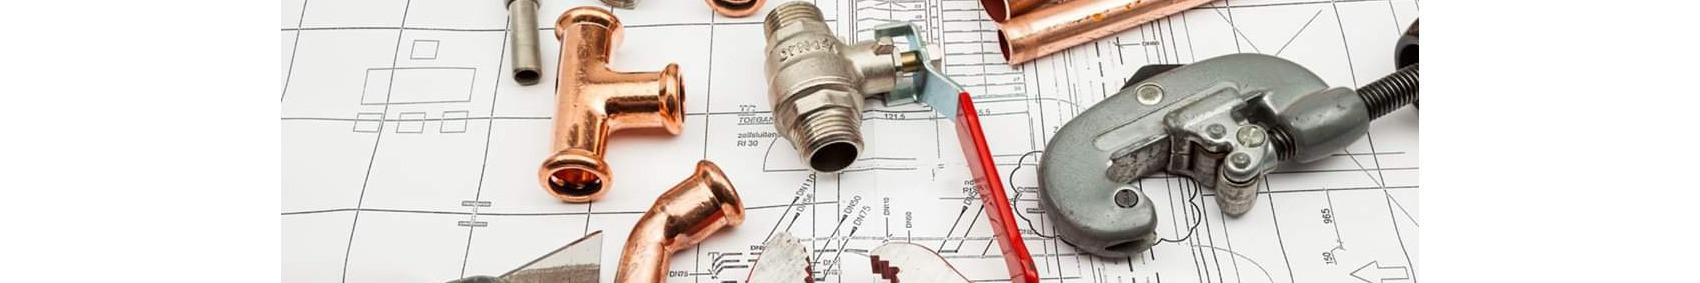 Norton & Hijas Plumbing and maintenance